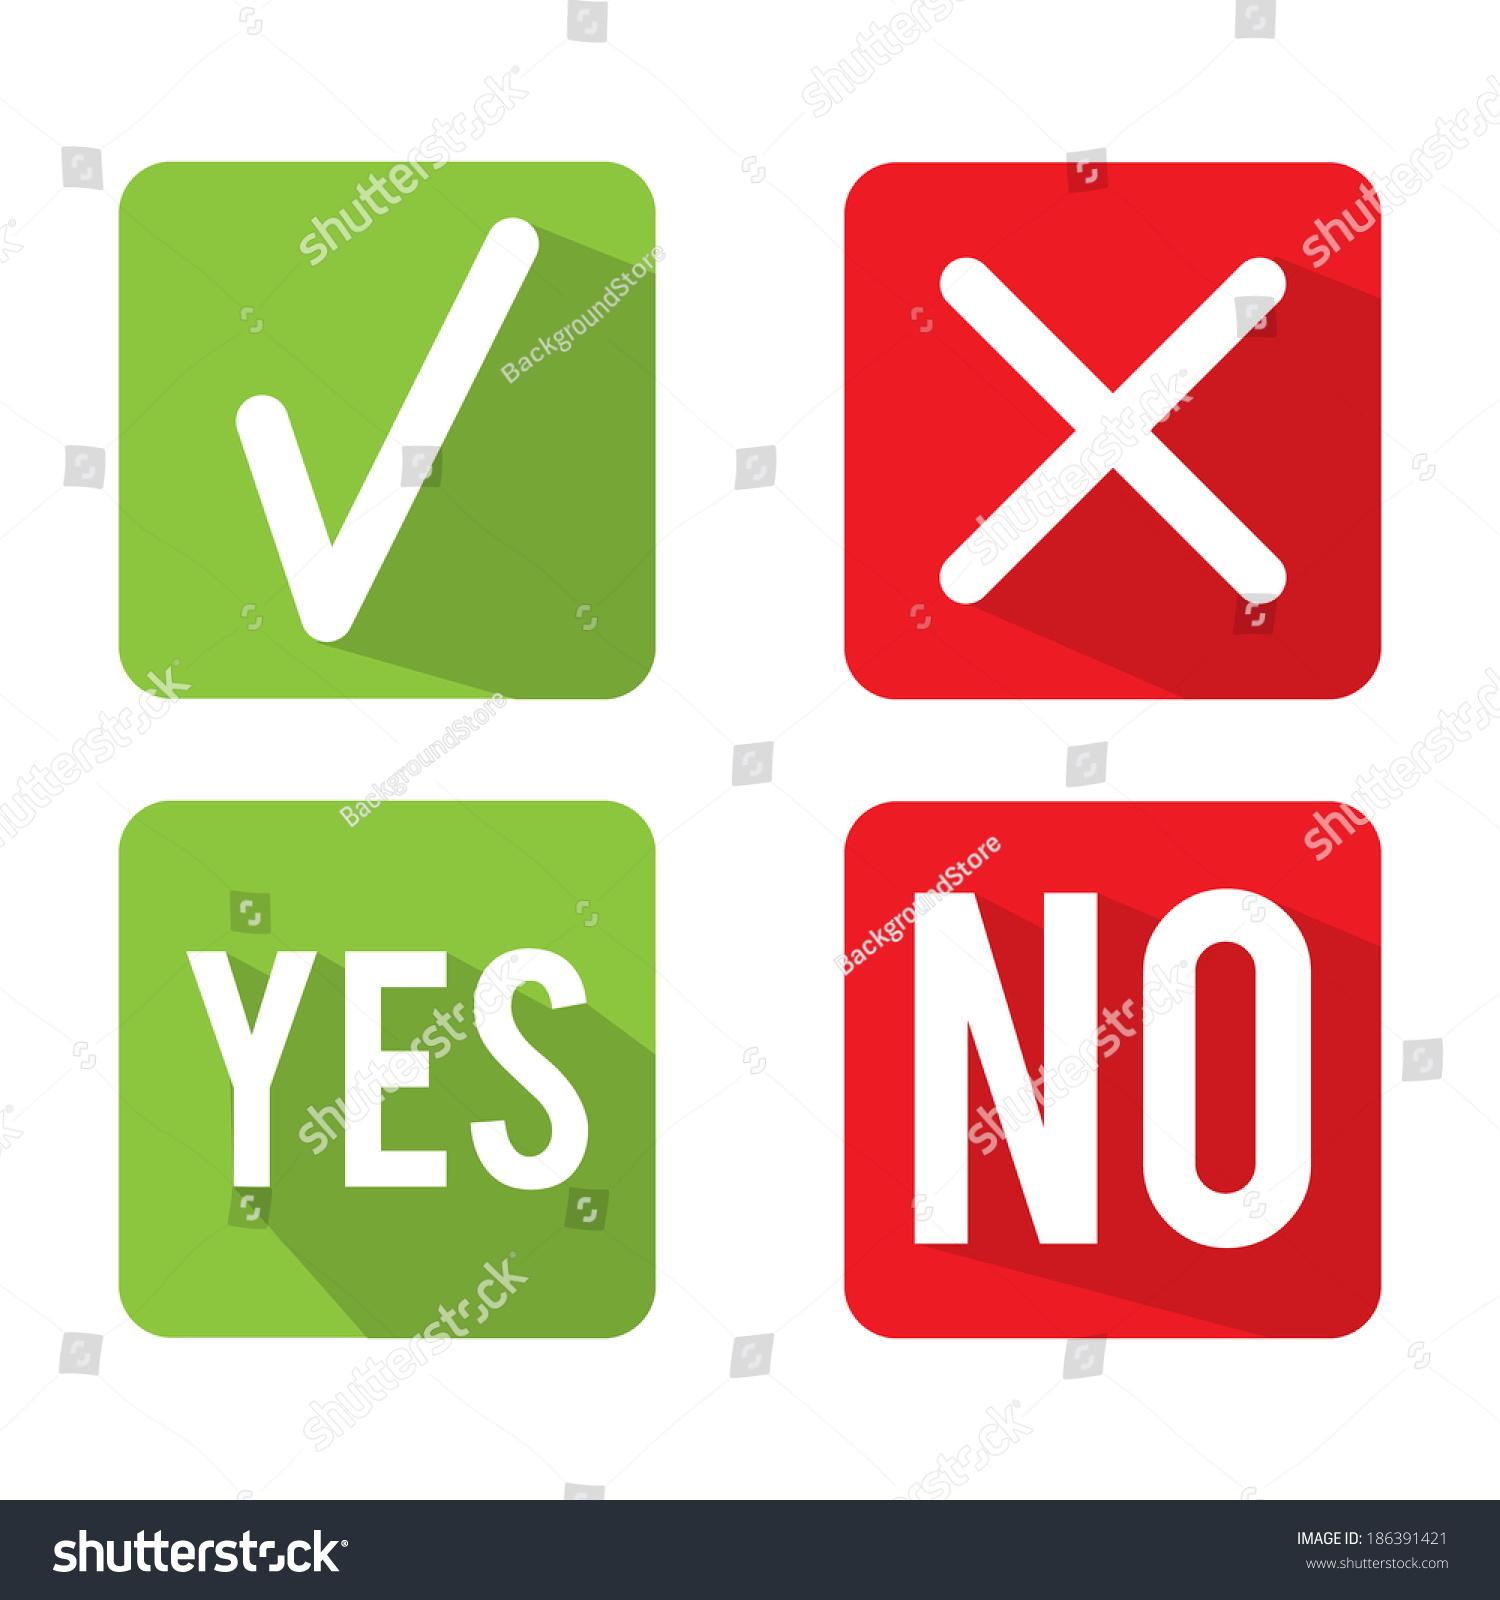 Yes checkbox. |Check Box Yes